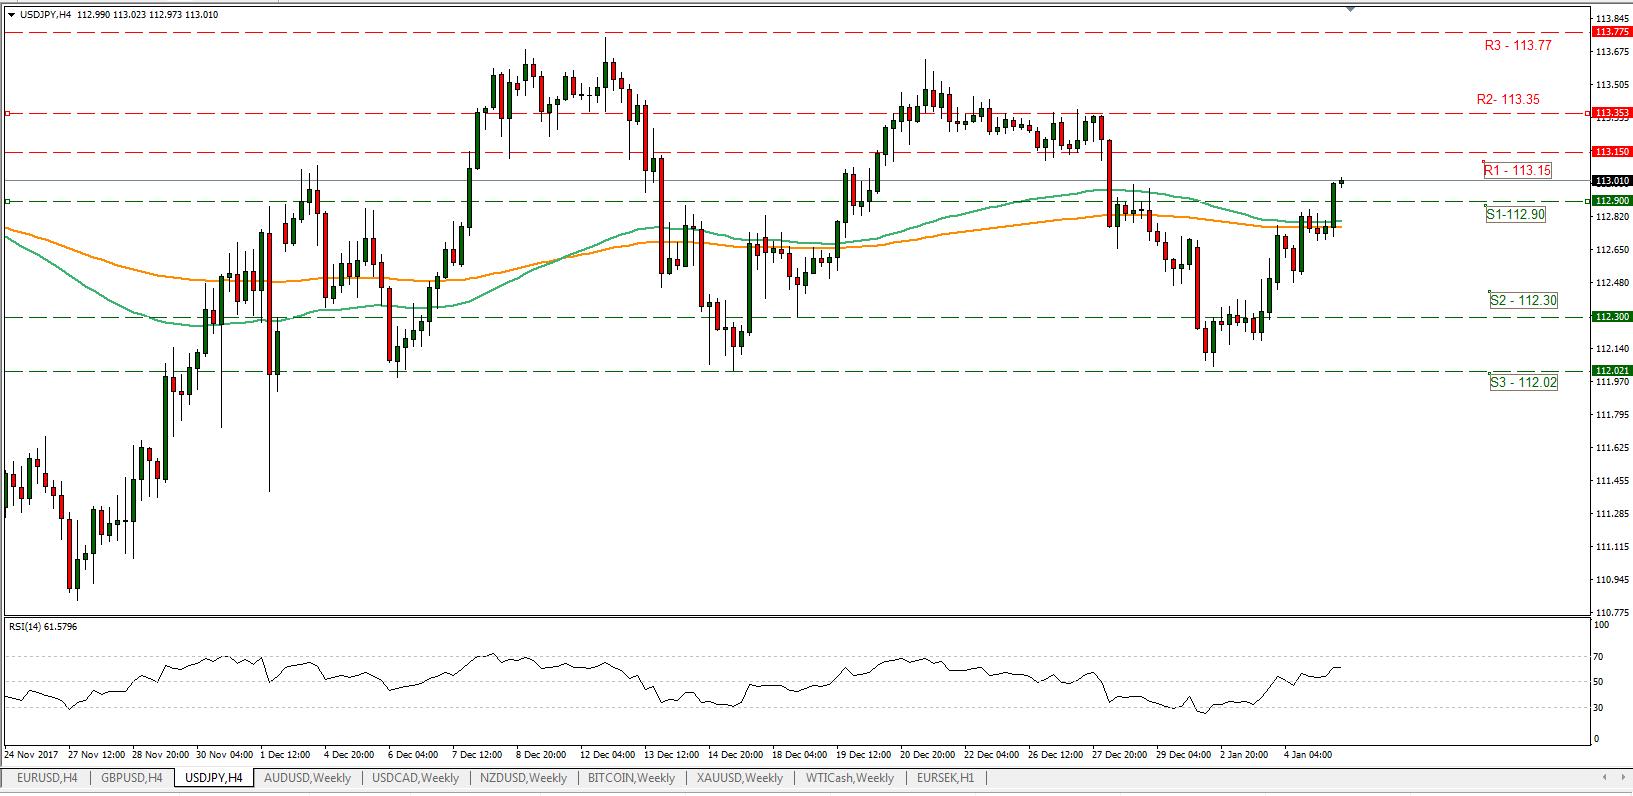 USD/JPY 05/01/2018 | Econ Alerts